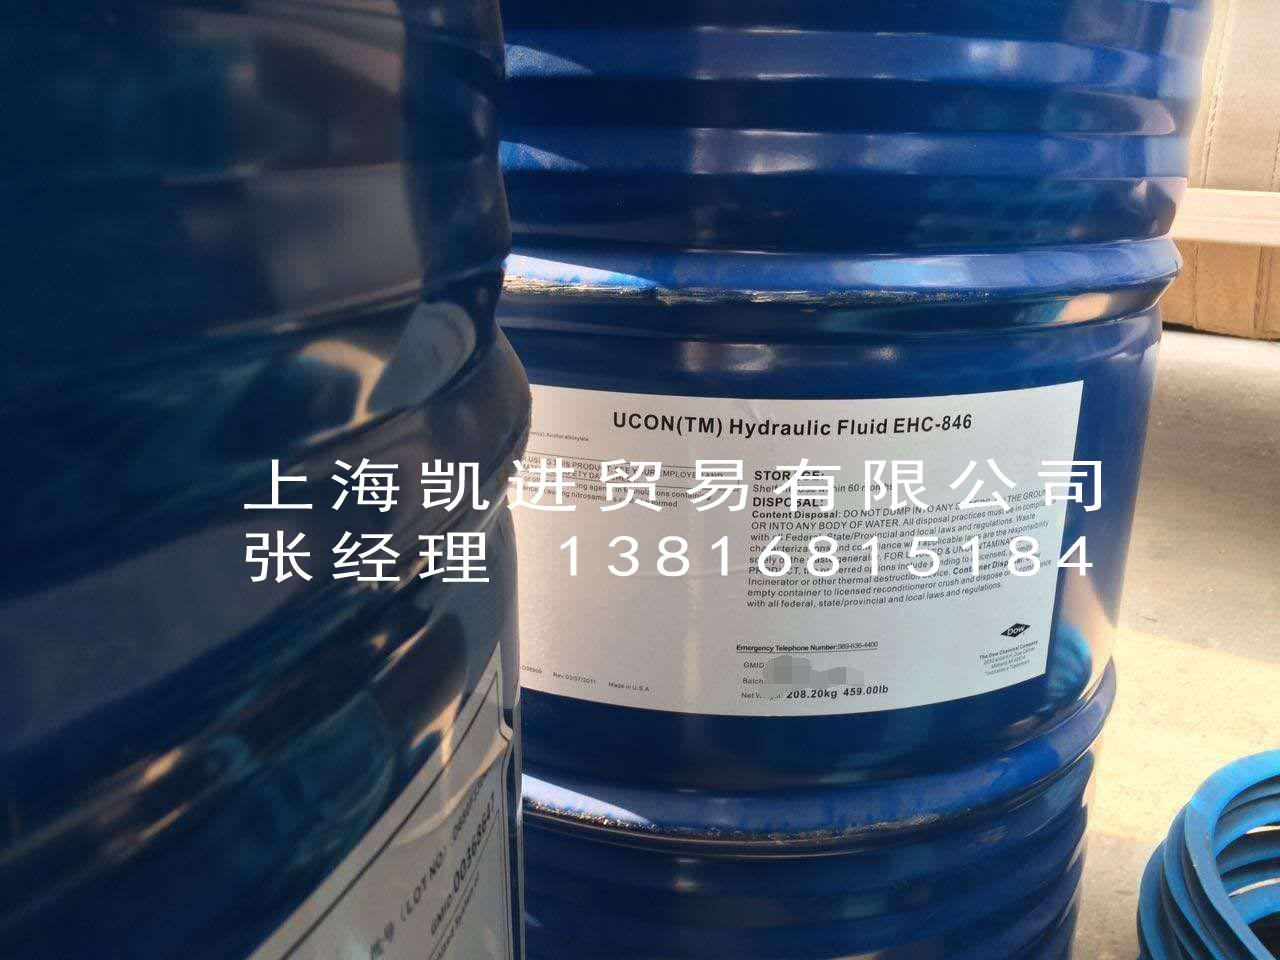 陶氏优康DOW UCON Hydraulic Fluid EHC-846阻燃液压油